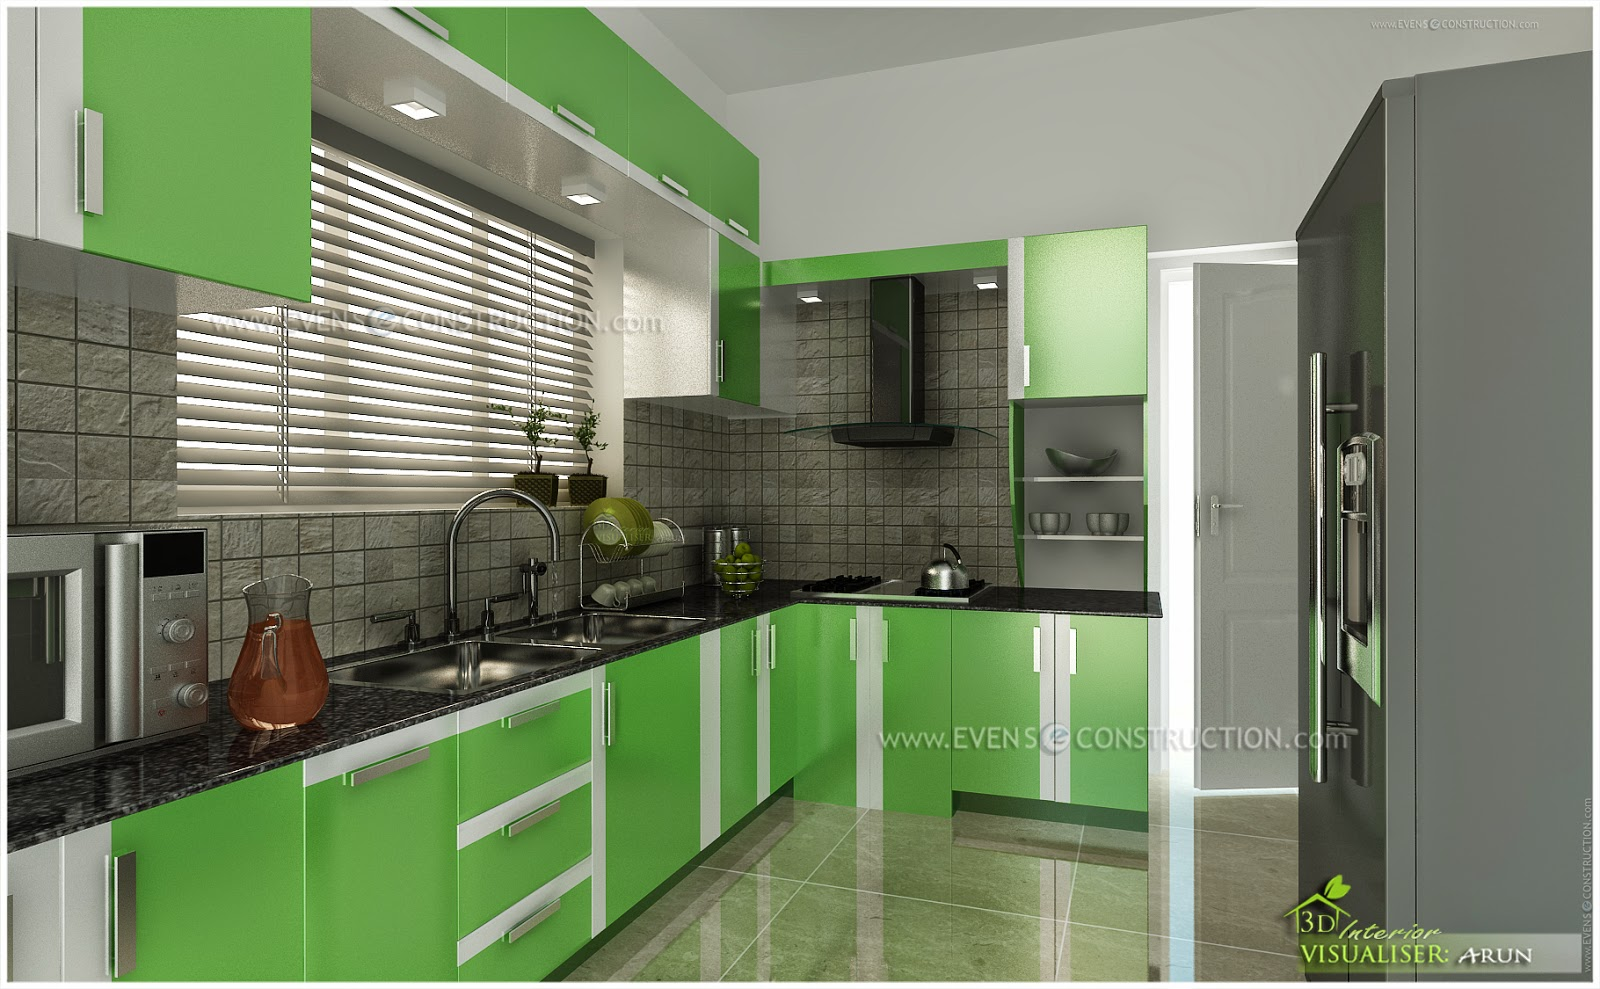 Evens Construction Pvt Ltd: Small Kerala kitchen interior ...